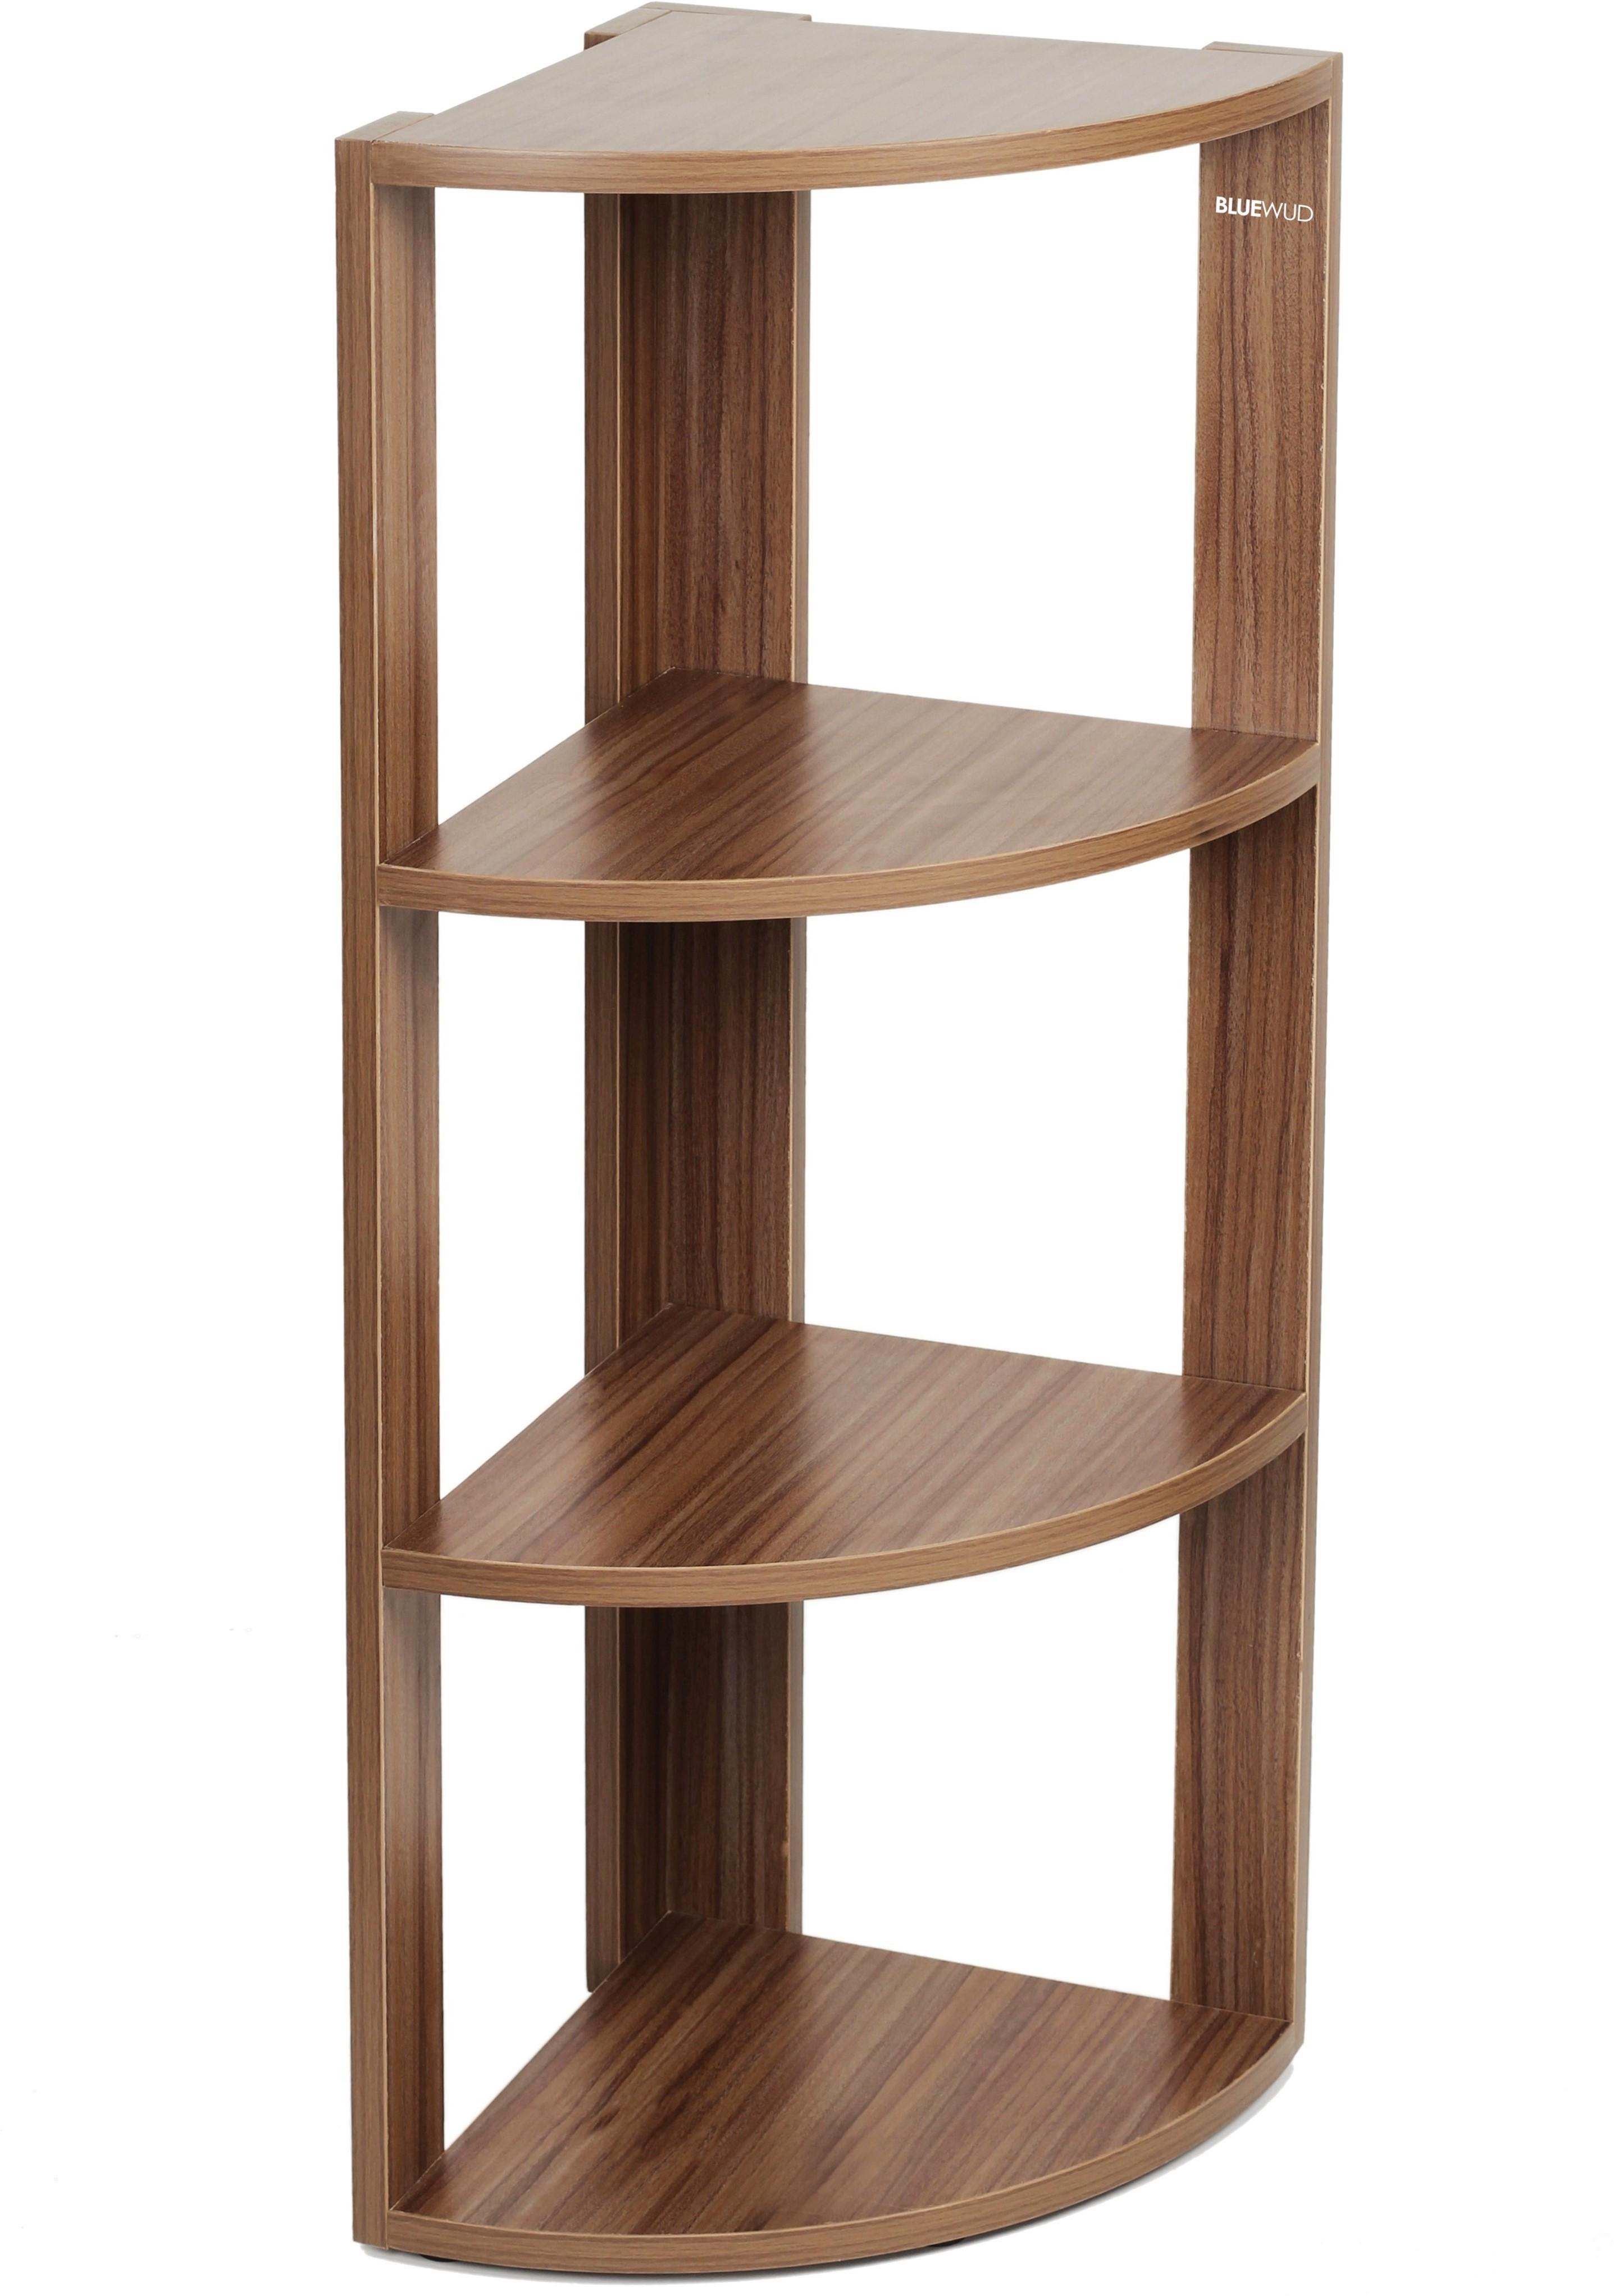 View Bluewud Alba Engineered Wood Open Book Shelf(Finish Color - Walnut) Furniture (Bluewud)